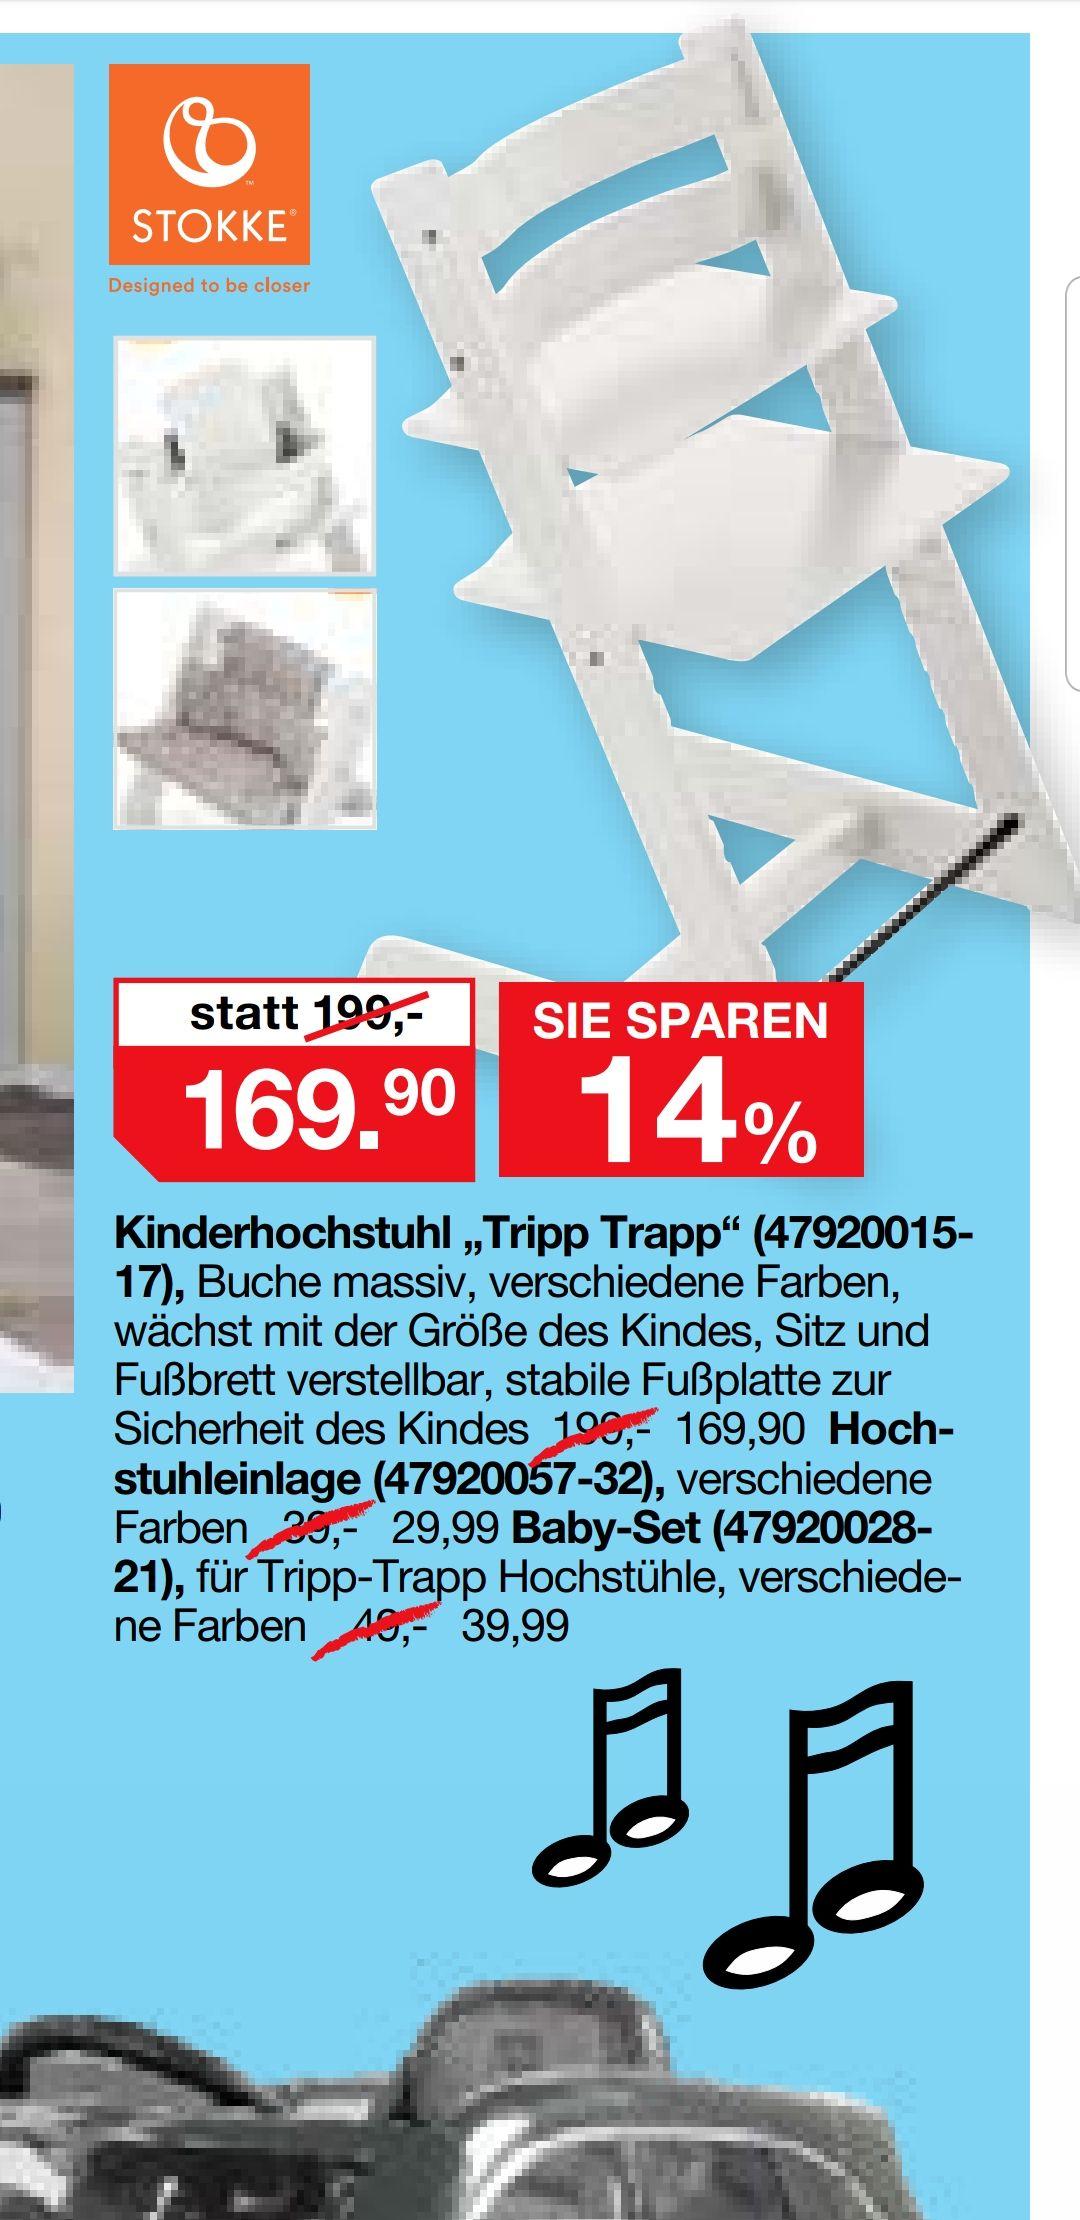 [Lokal] Möbelhaus Pforzheim - Stokke Tripp Trapp Kinderhochstuhl [Preisgarantie]